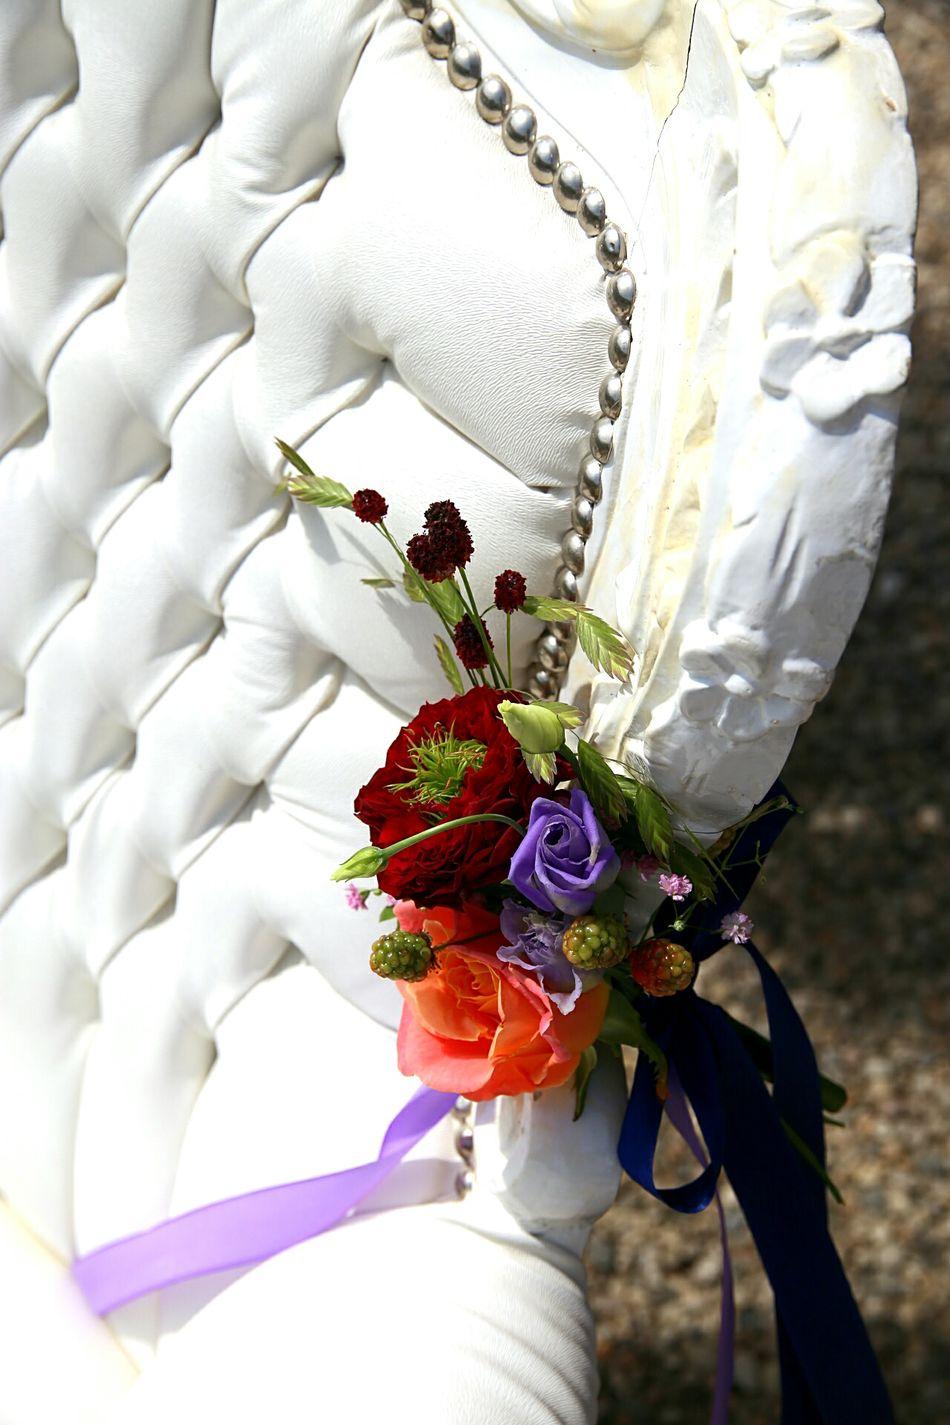 Weddings Around The World Flower #flowers #flowerporn #flowermagic #flowermagic #flowerpower #flowerlovers #instaflower #花 #花愛撫 #切ない #今夜も眠れない #今夜も Flower Collection Weddingday  Wedding Party Wedding Photography